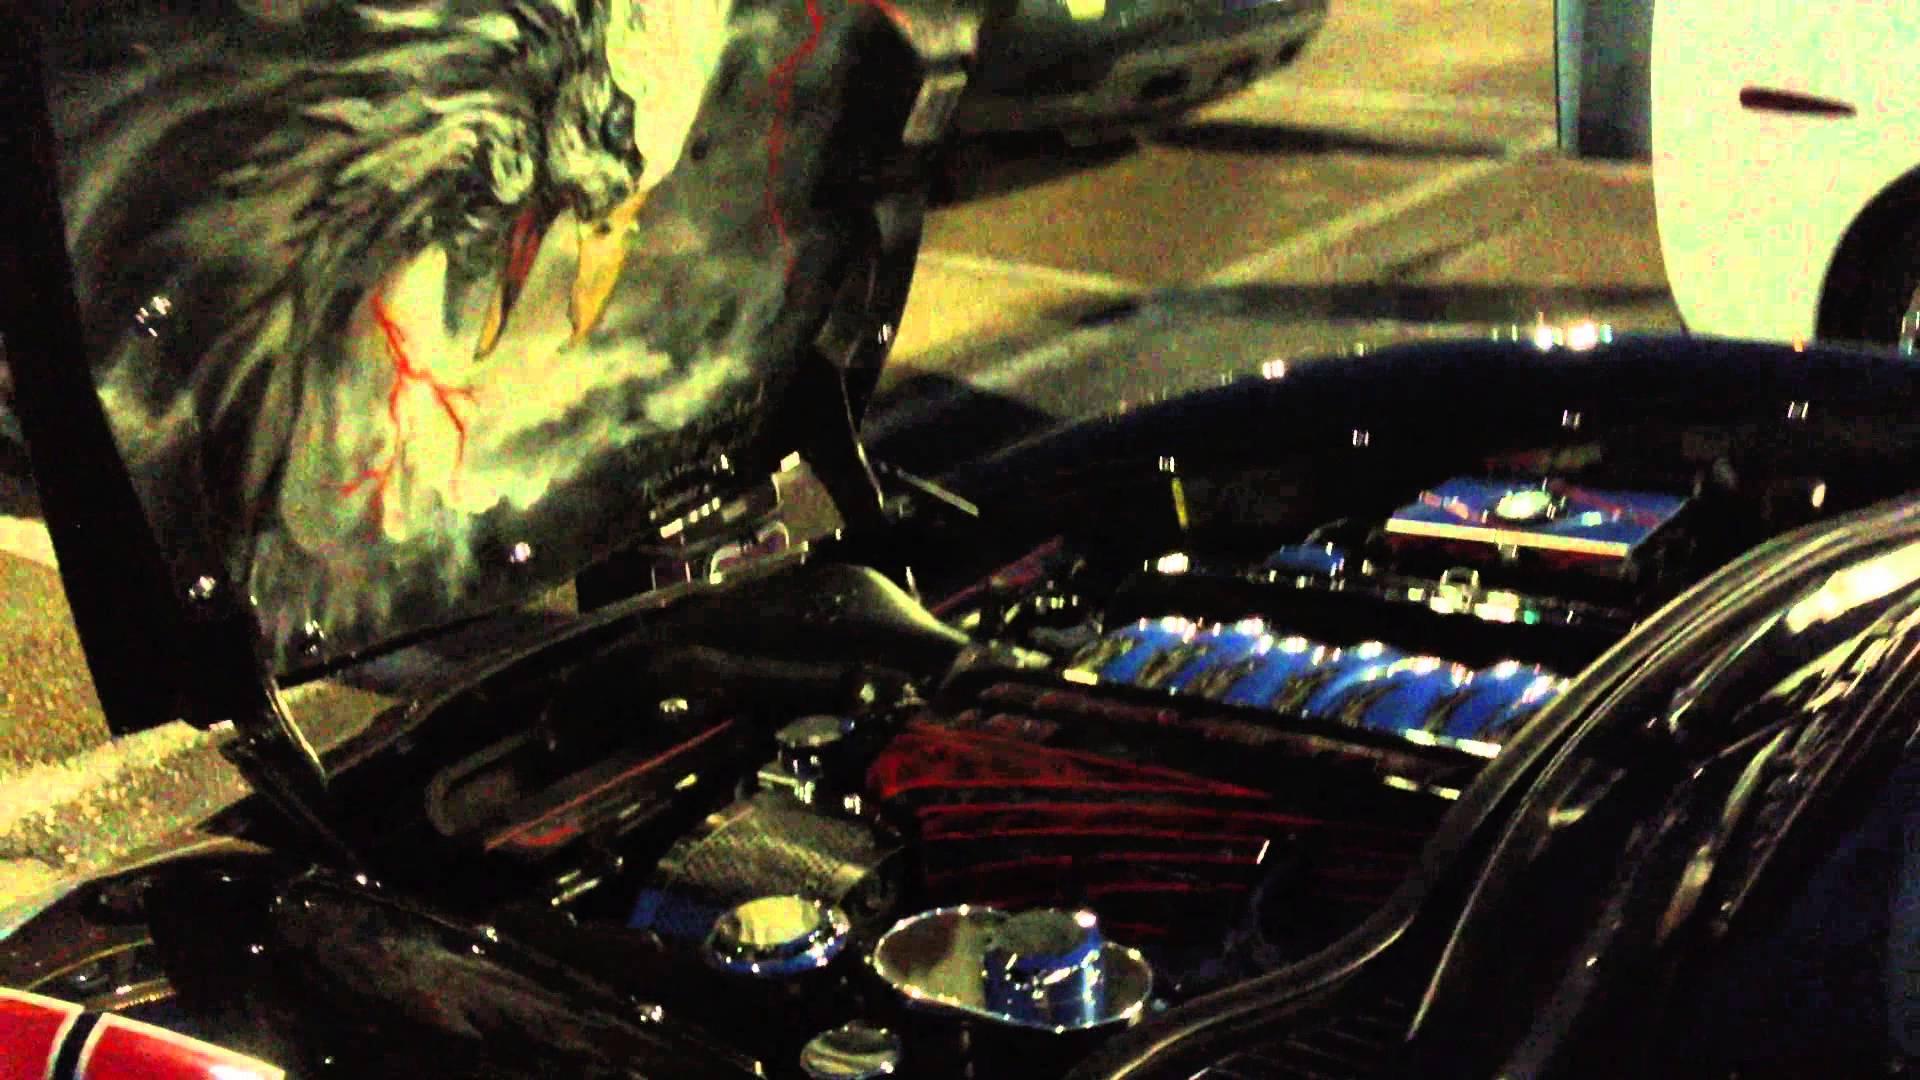 Karen Bedell in Baton Rouge, LA gives a Corvette light show